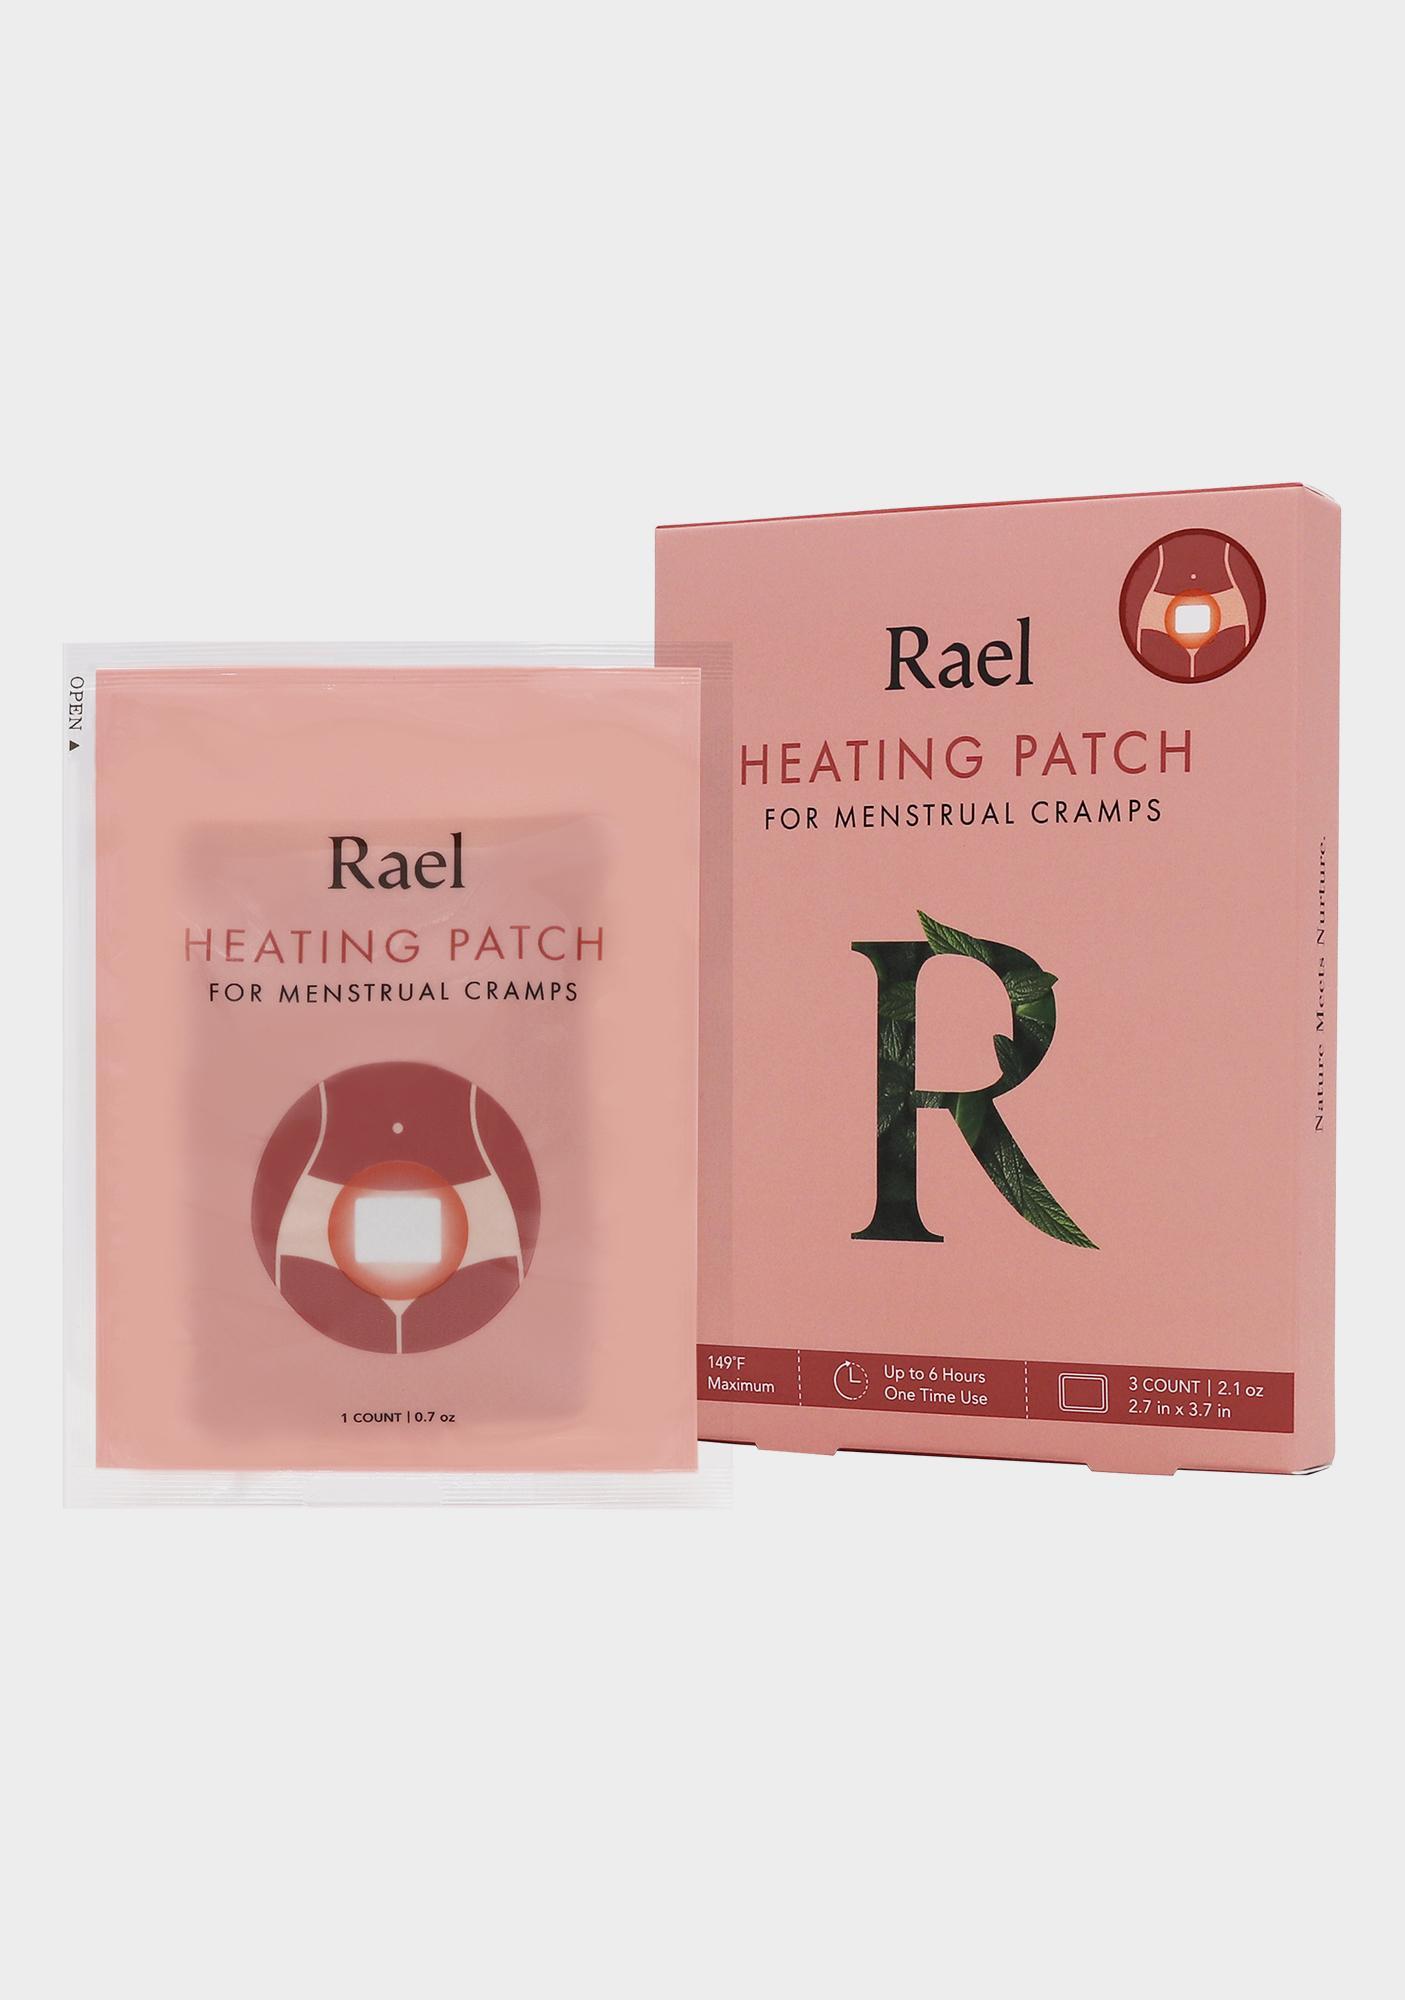 Rael Menstrual Cramps Heating Patch